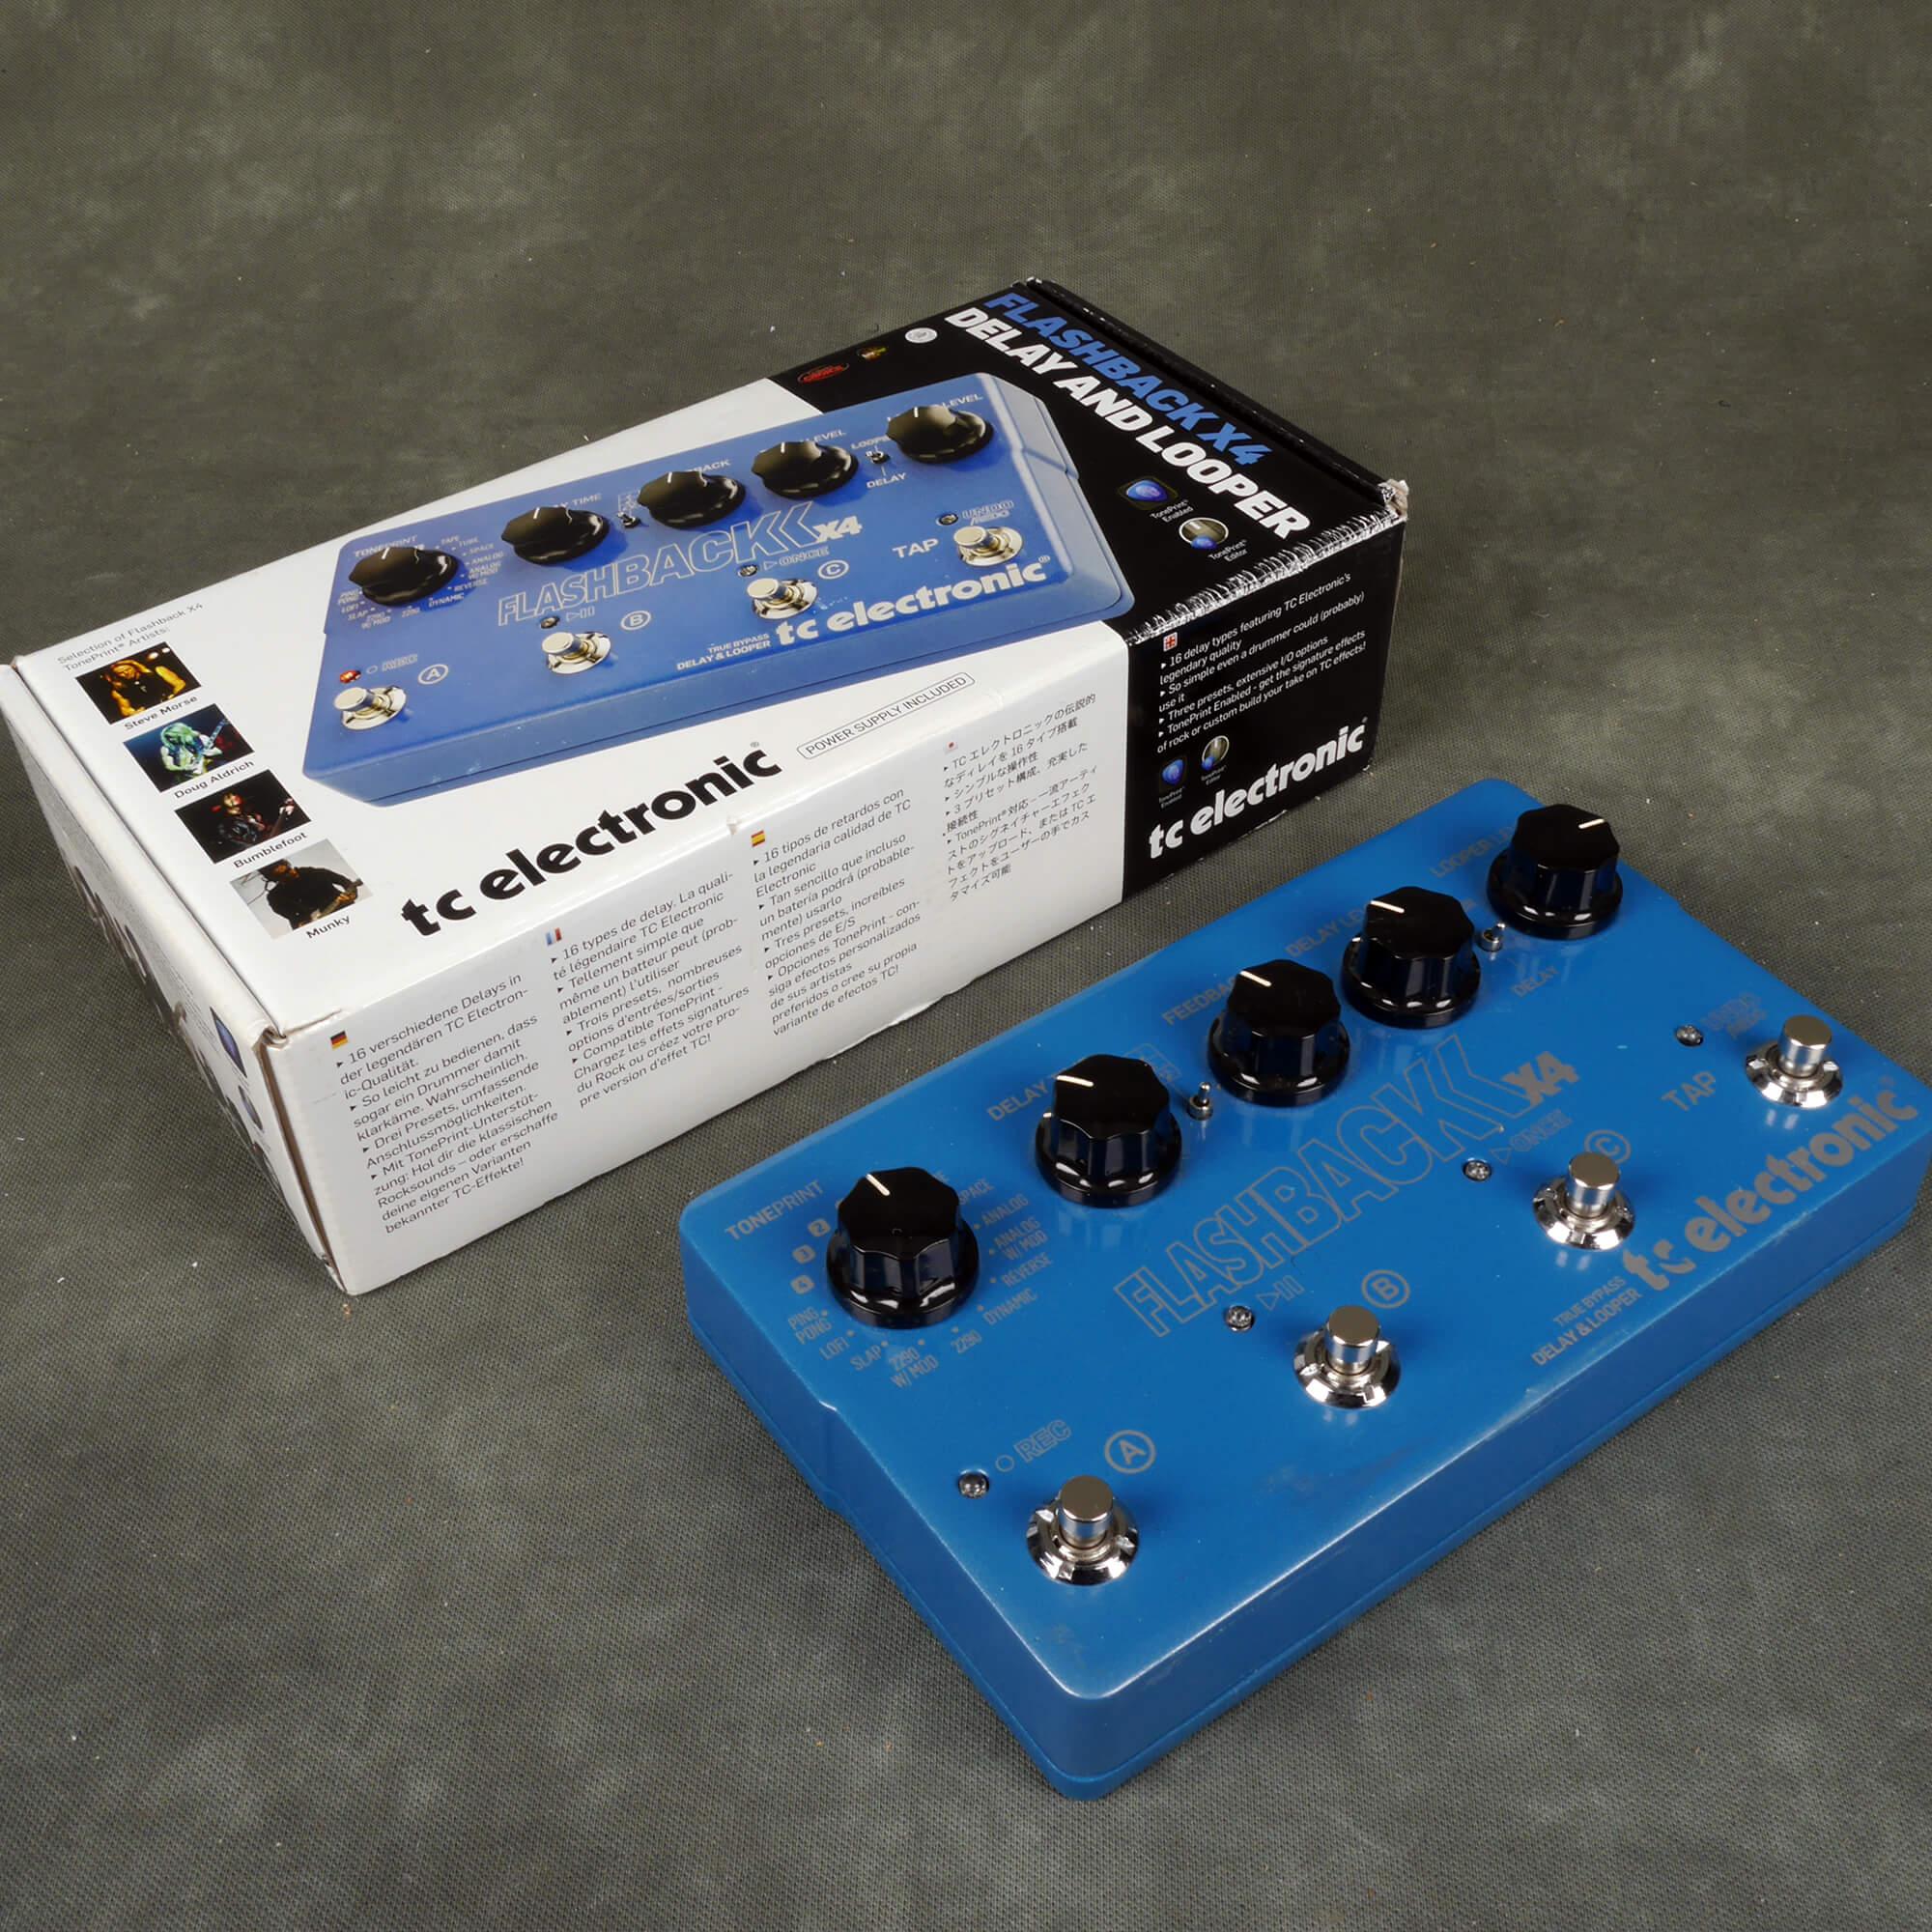 TC Electronic Flashback X4 Delay FX Pedal w/Box - 2nd Hand